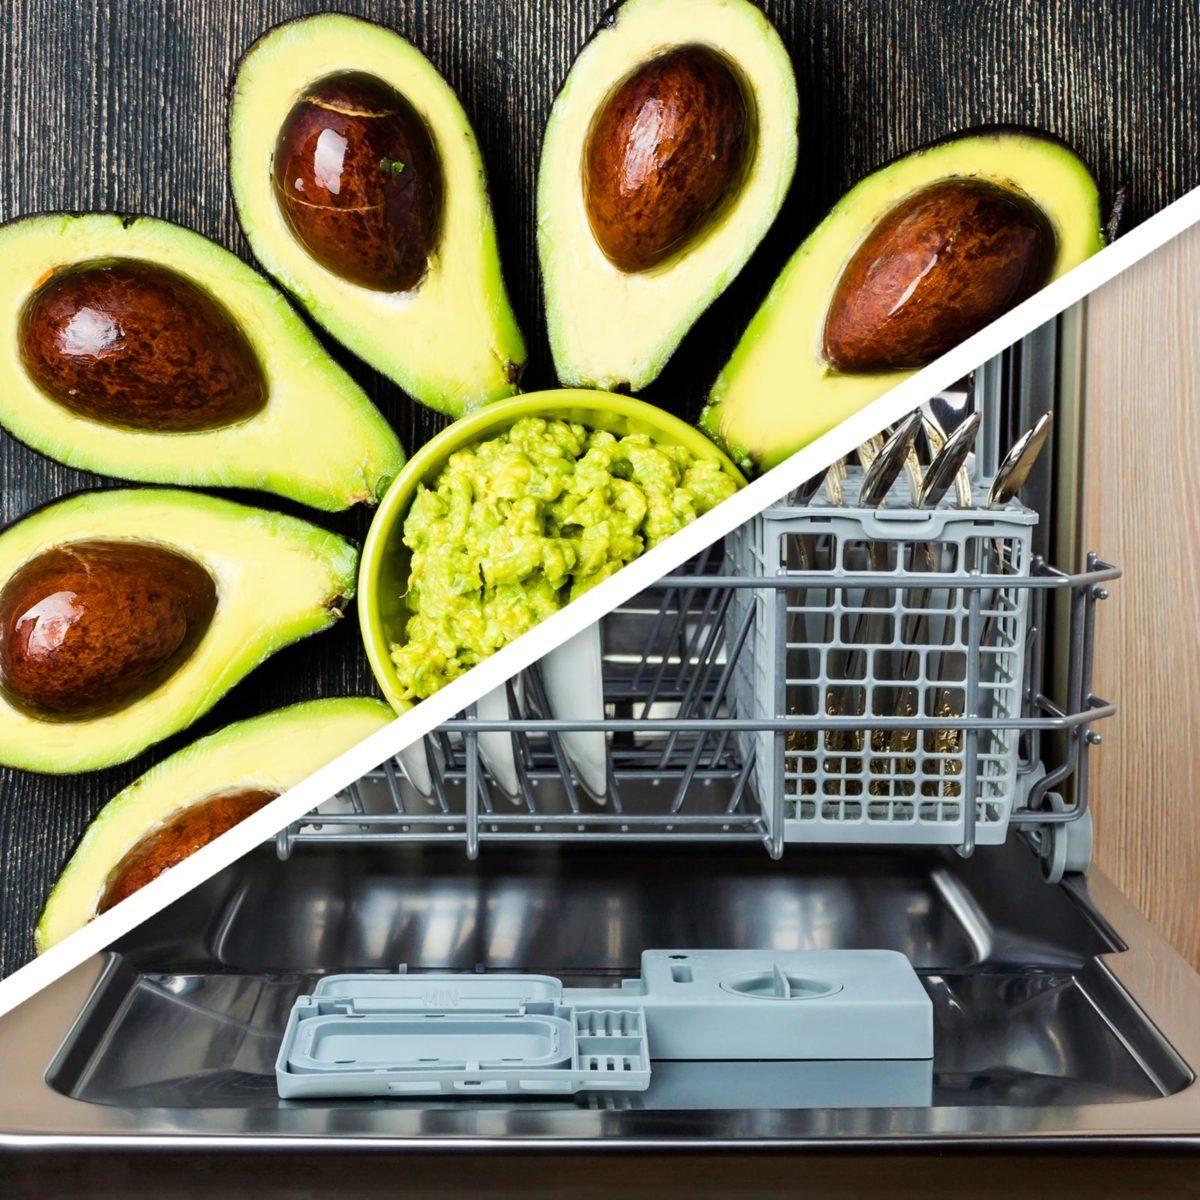 Avocados and dishwasher